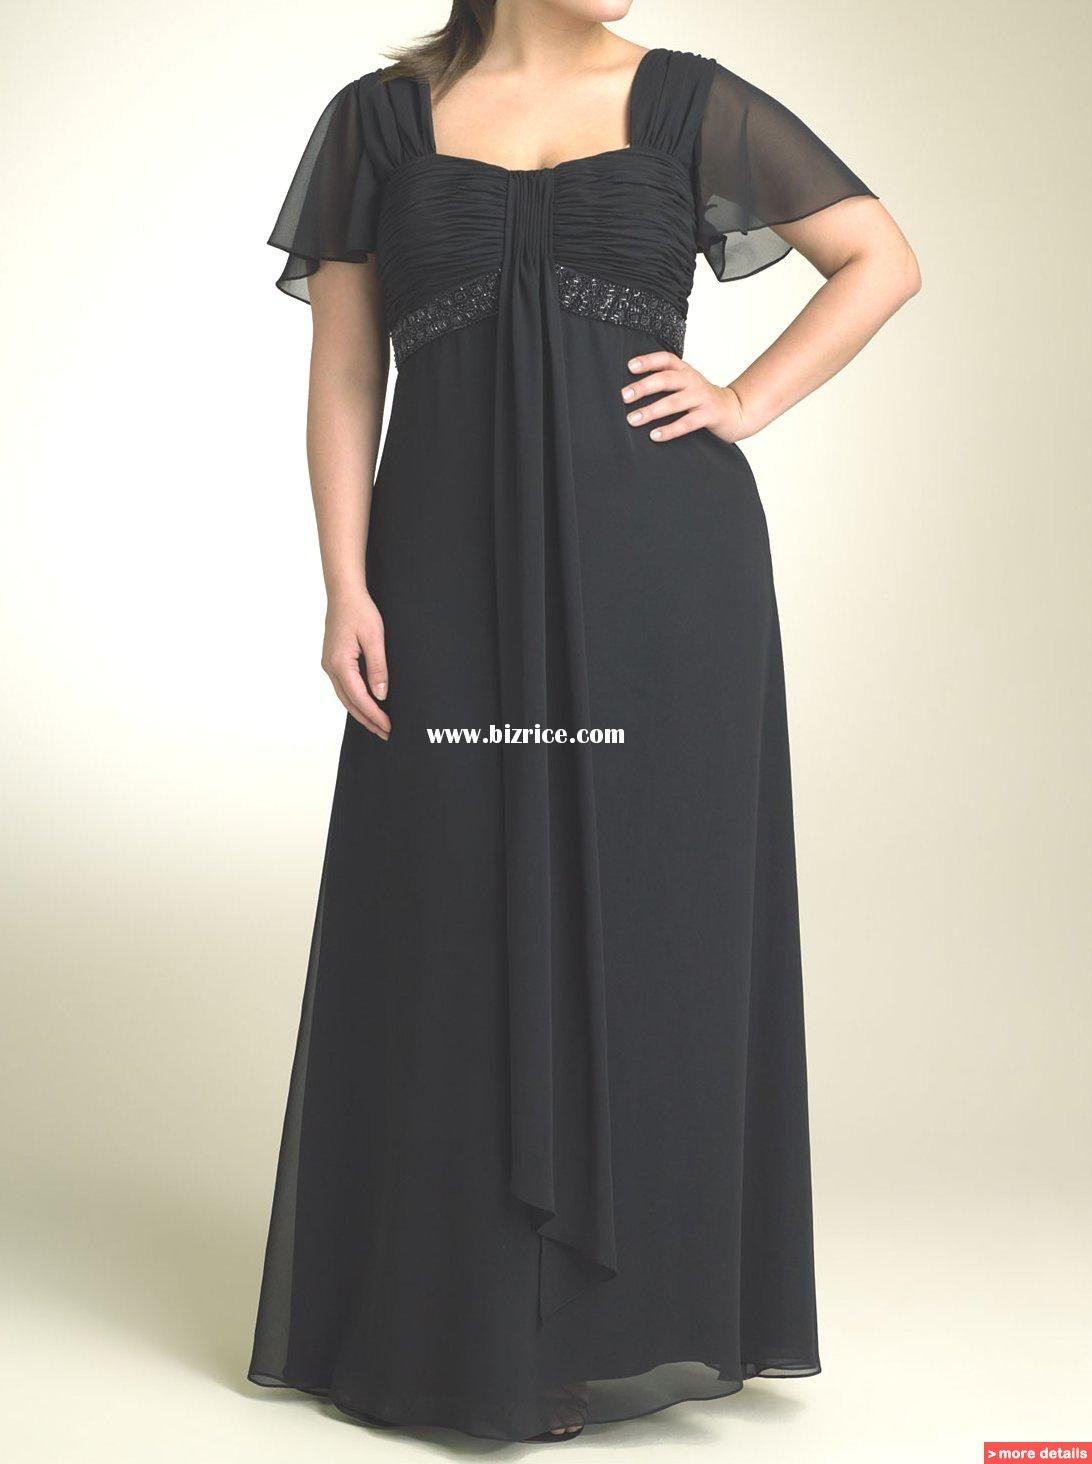 Plus Size Fashion For Women Woman Clothing Wholesale Plus Size